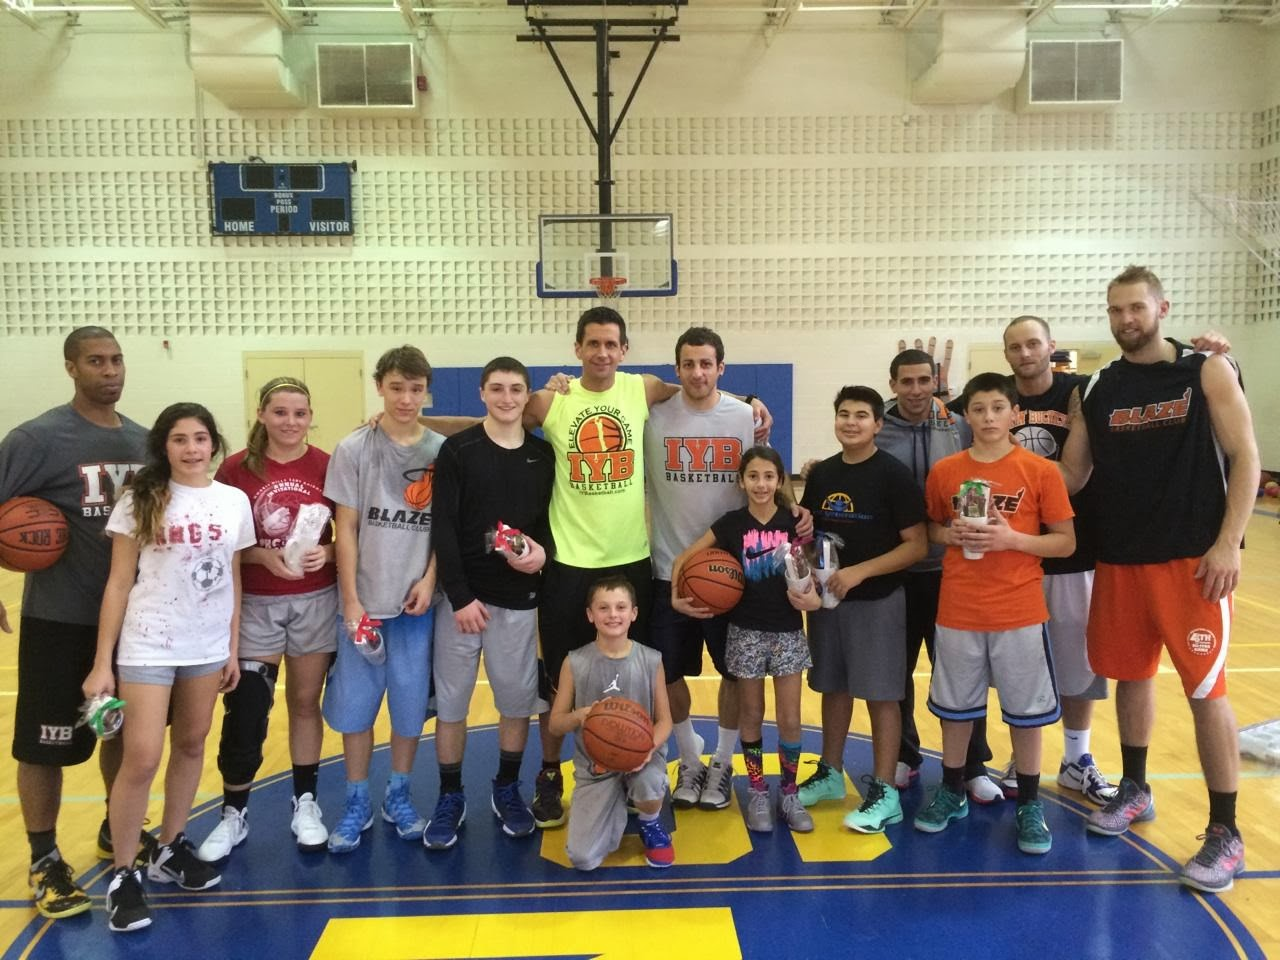 HOME OF THE BLAZE BASKETBALL CLUB: 12/06/13